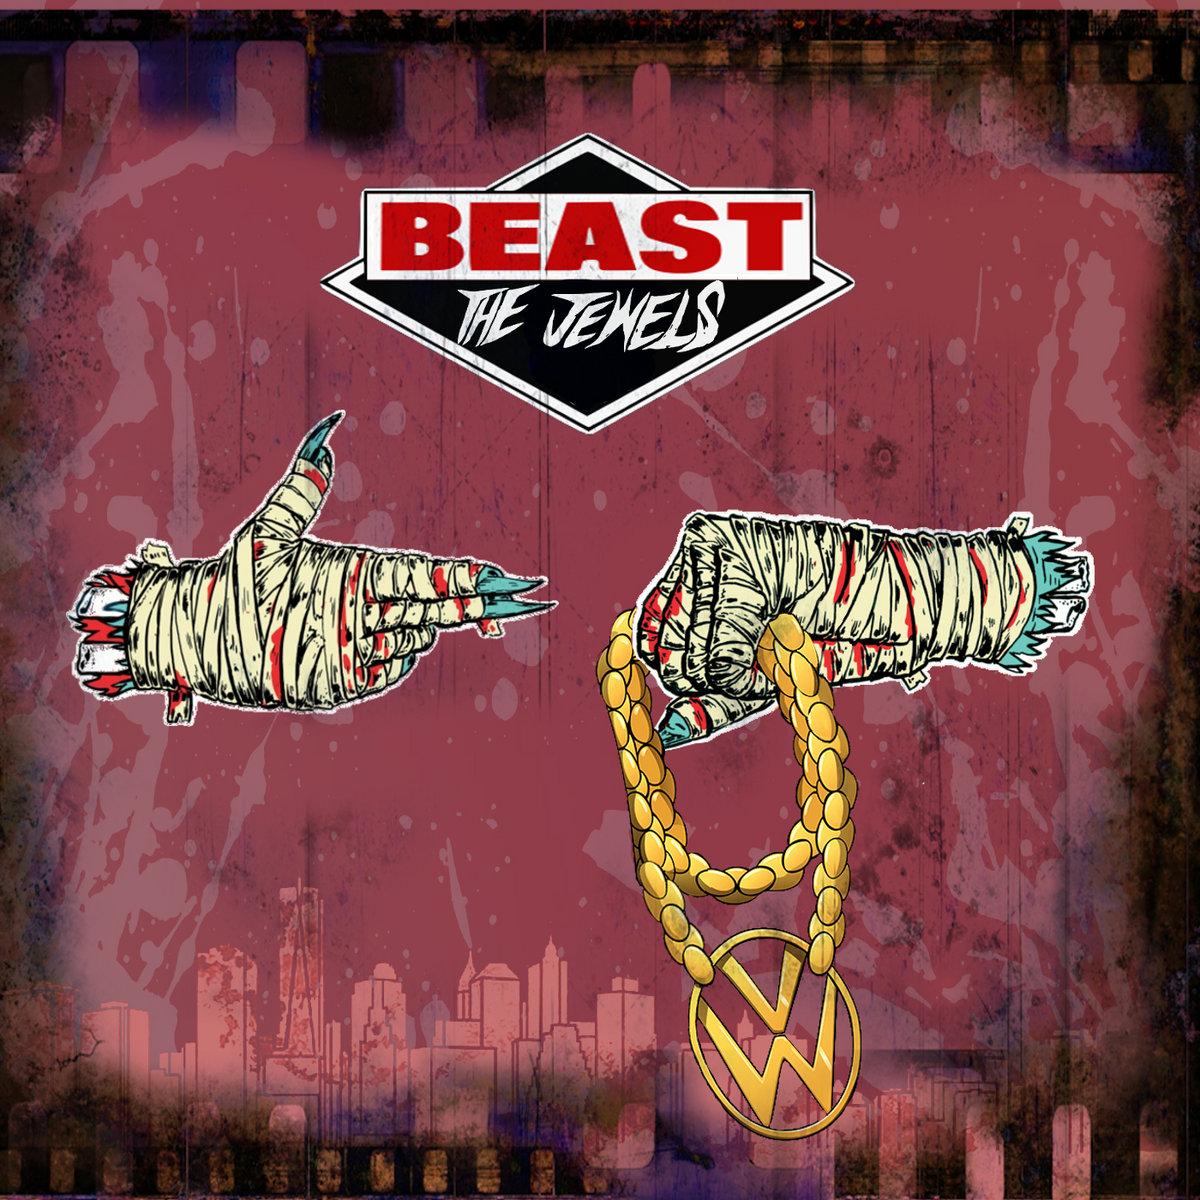 Beast the Jewels | Beastie Boys vs Run the Jewels | David Begun MashUp Tape im Stream und Download